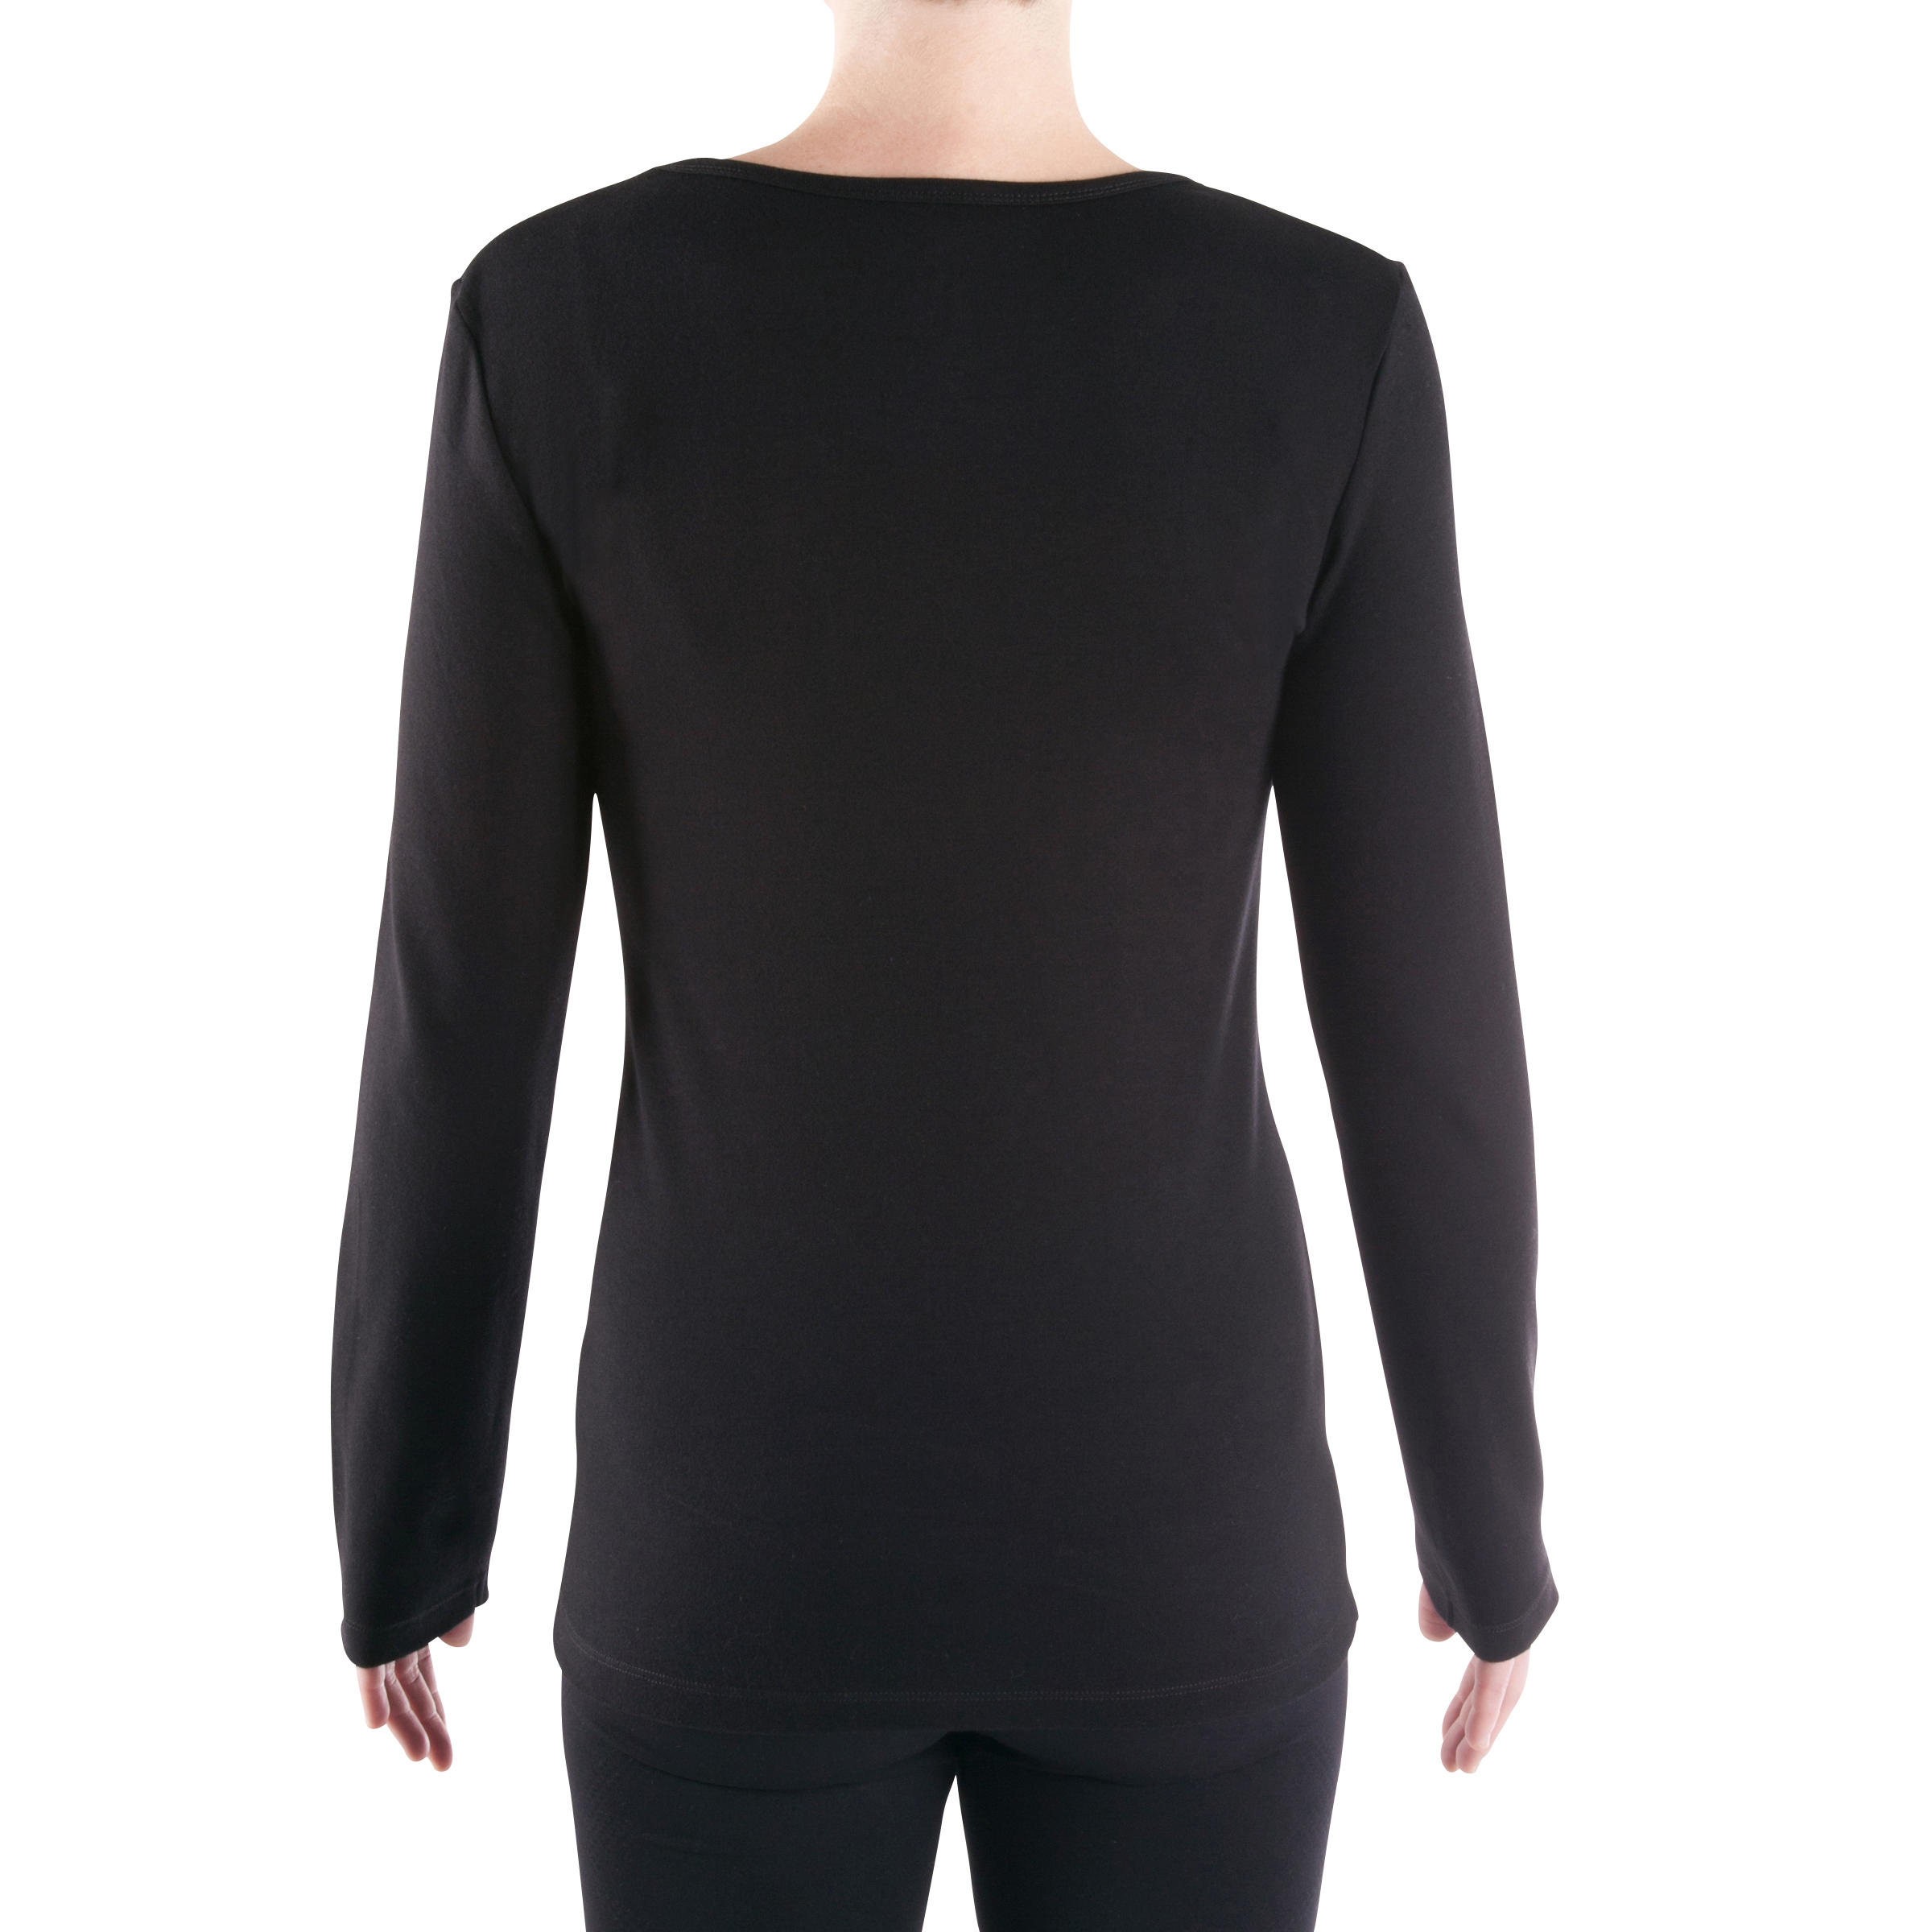 orgánico manga larga GimnasioYoga Mujer Negro Algodón Suave Camiseta de xBsdhtQrC